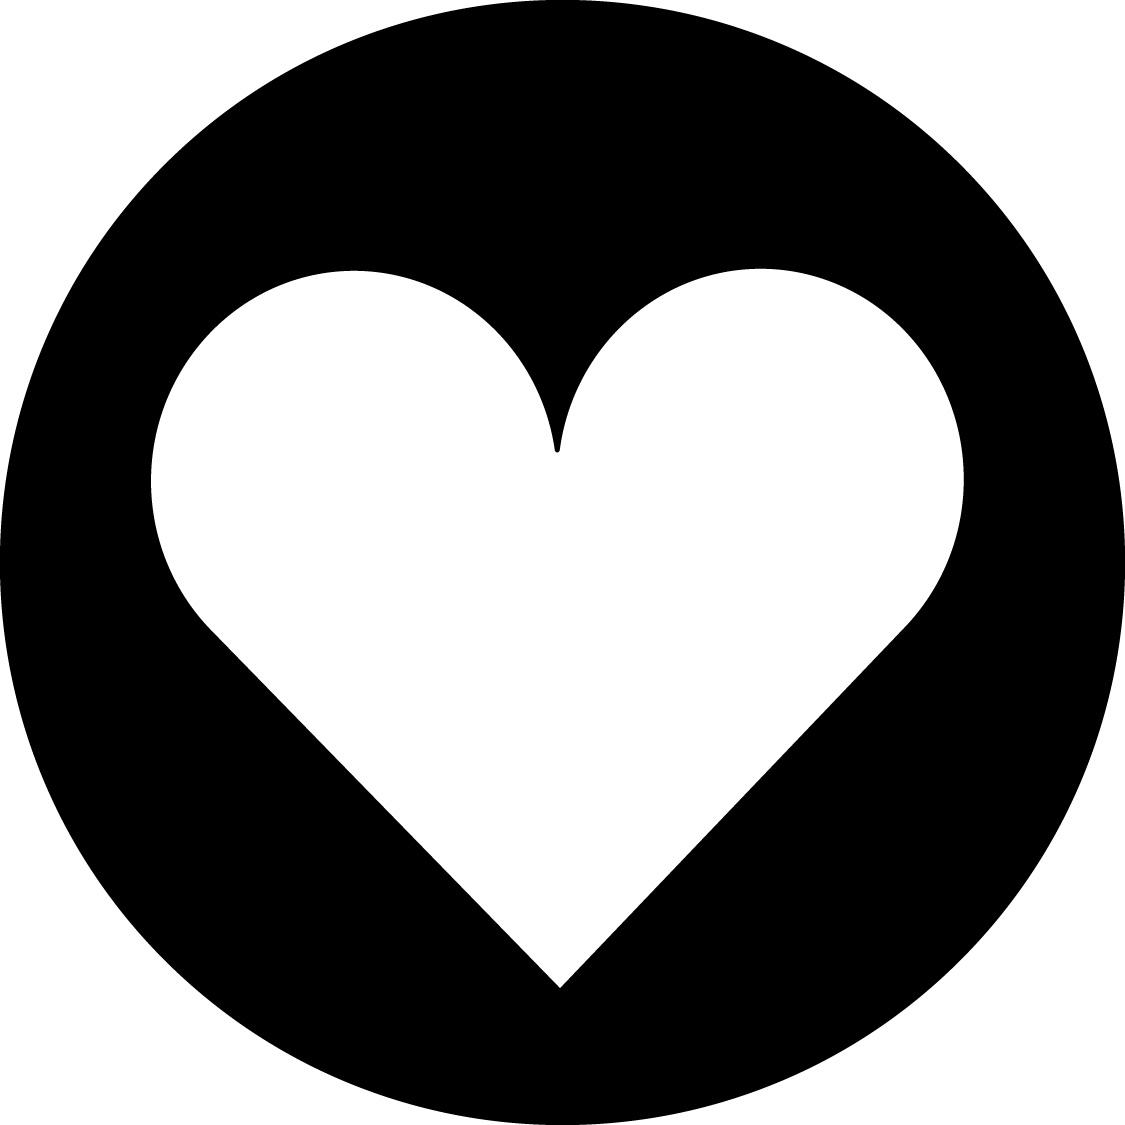 67 Black And White Heart Wallpaper On Wallpapersafari